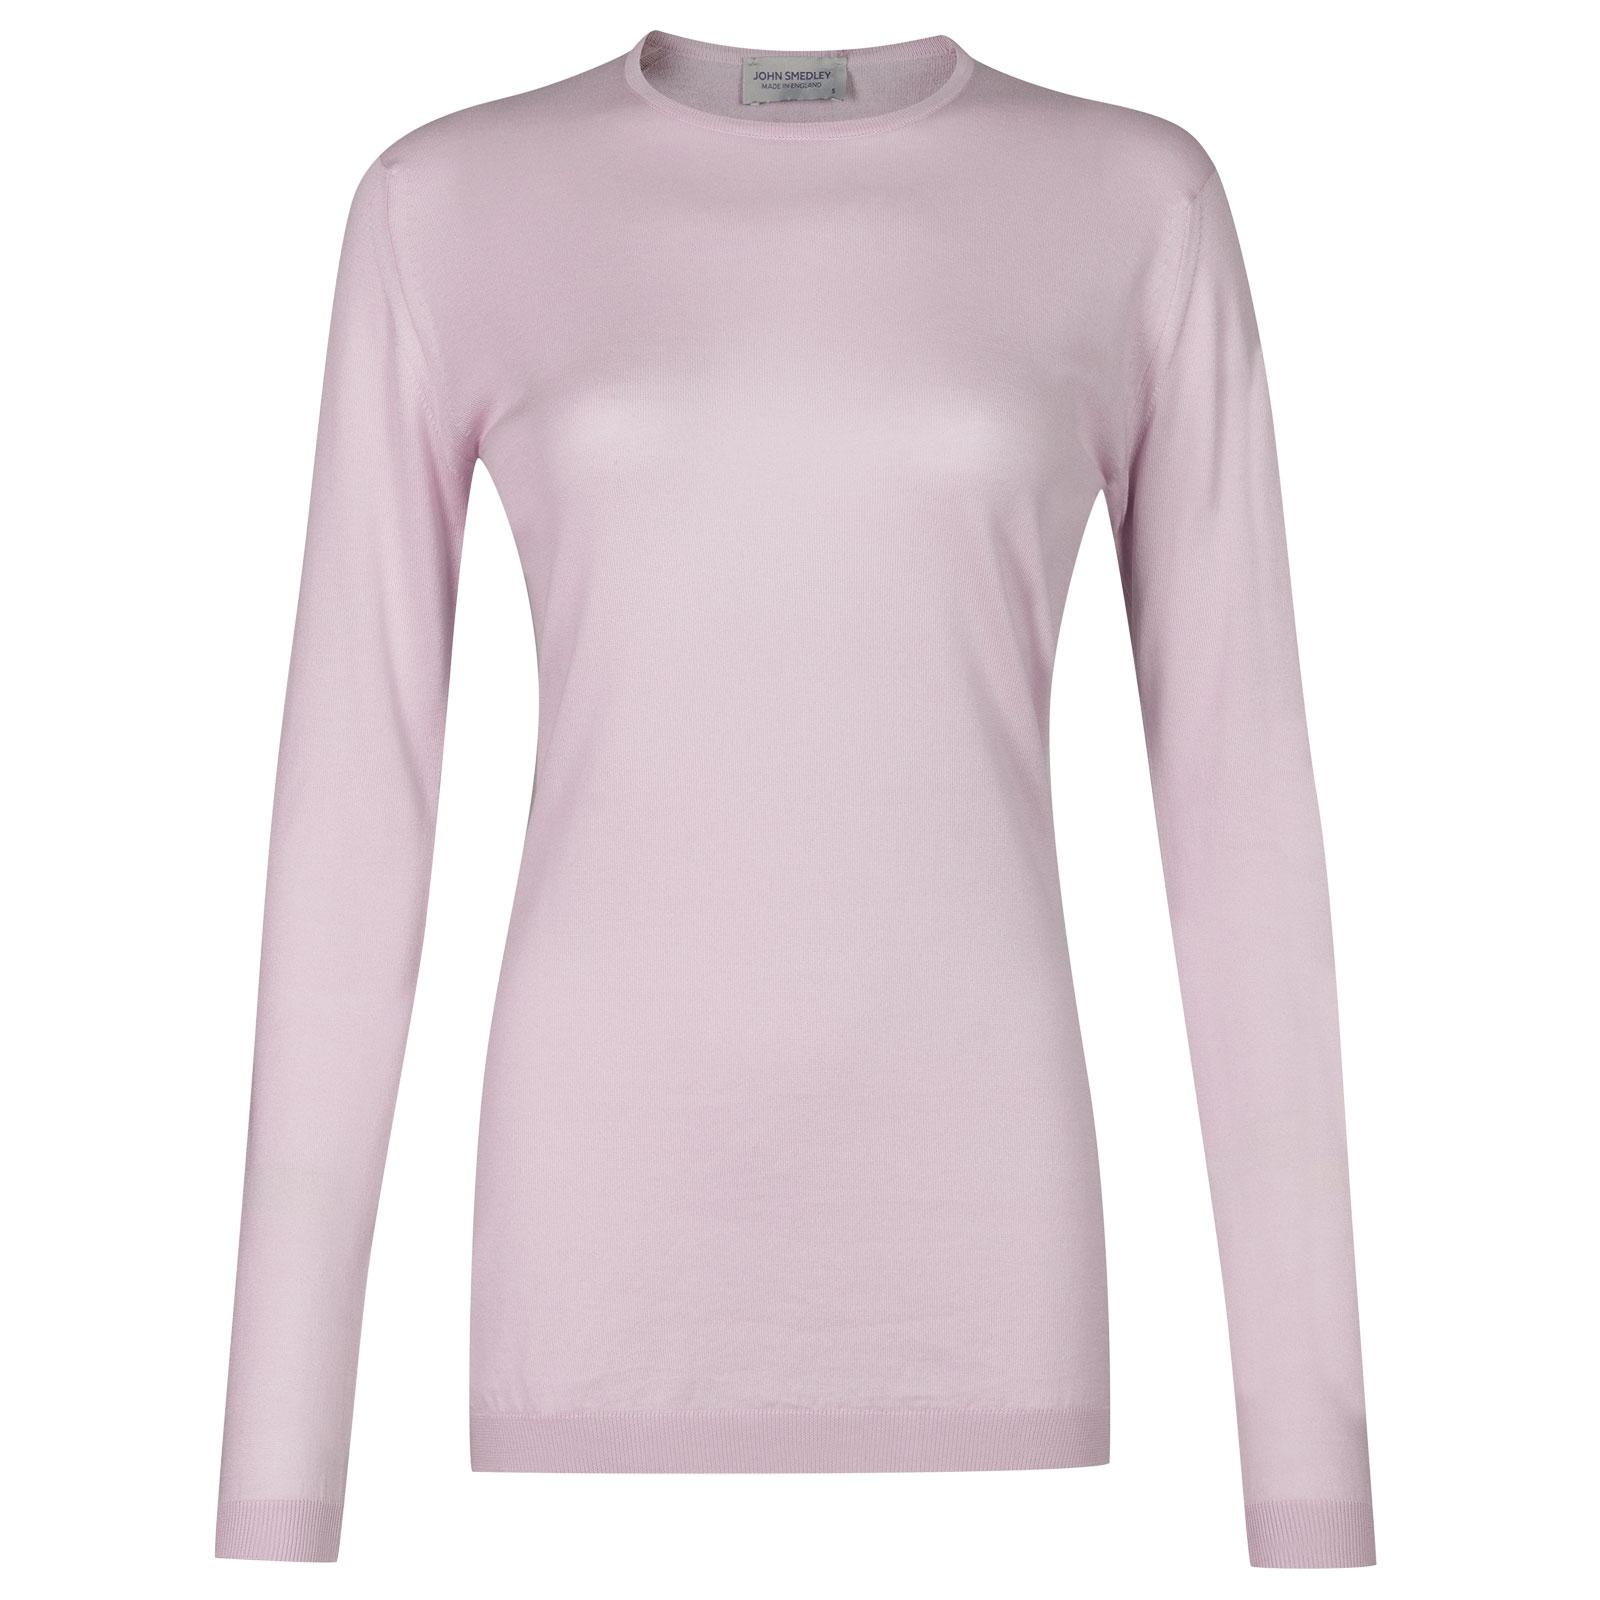 Airlie-keeling-pink-S